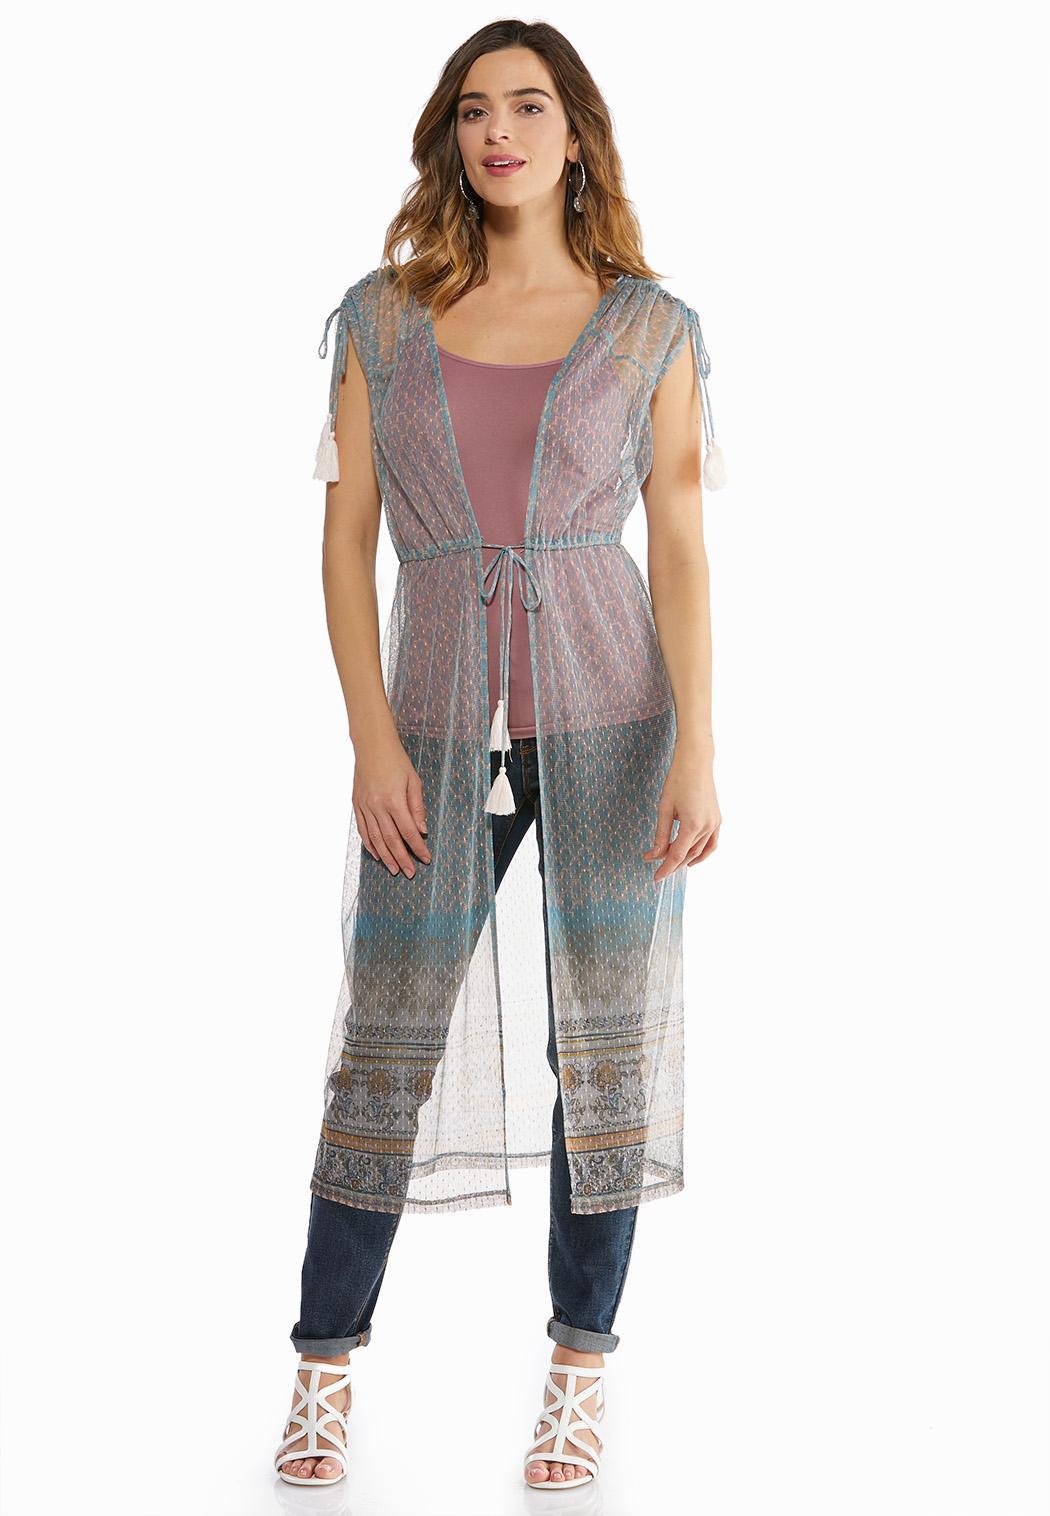 edf0ca24771 Women s Cardigans   Kimonos